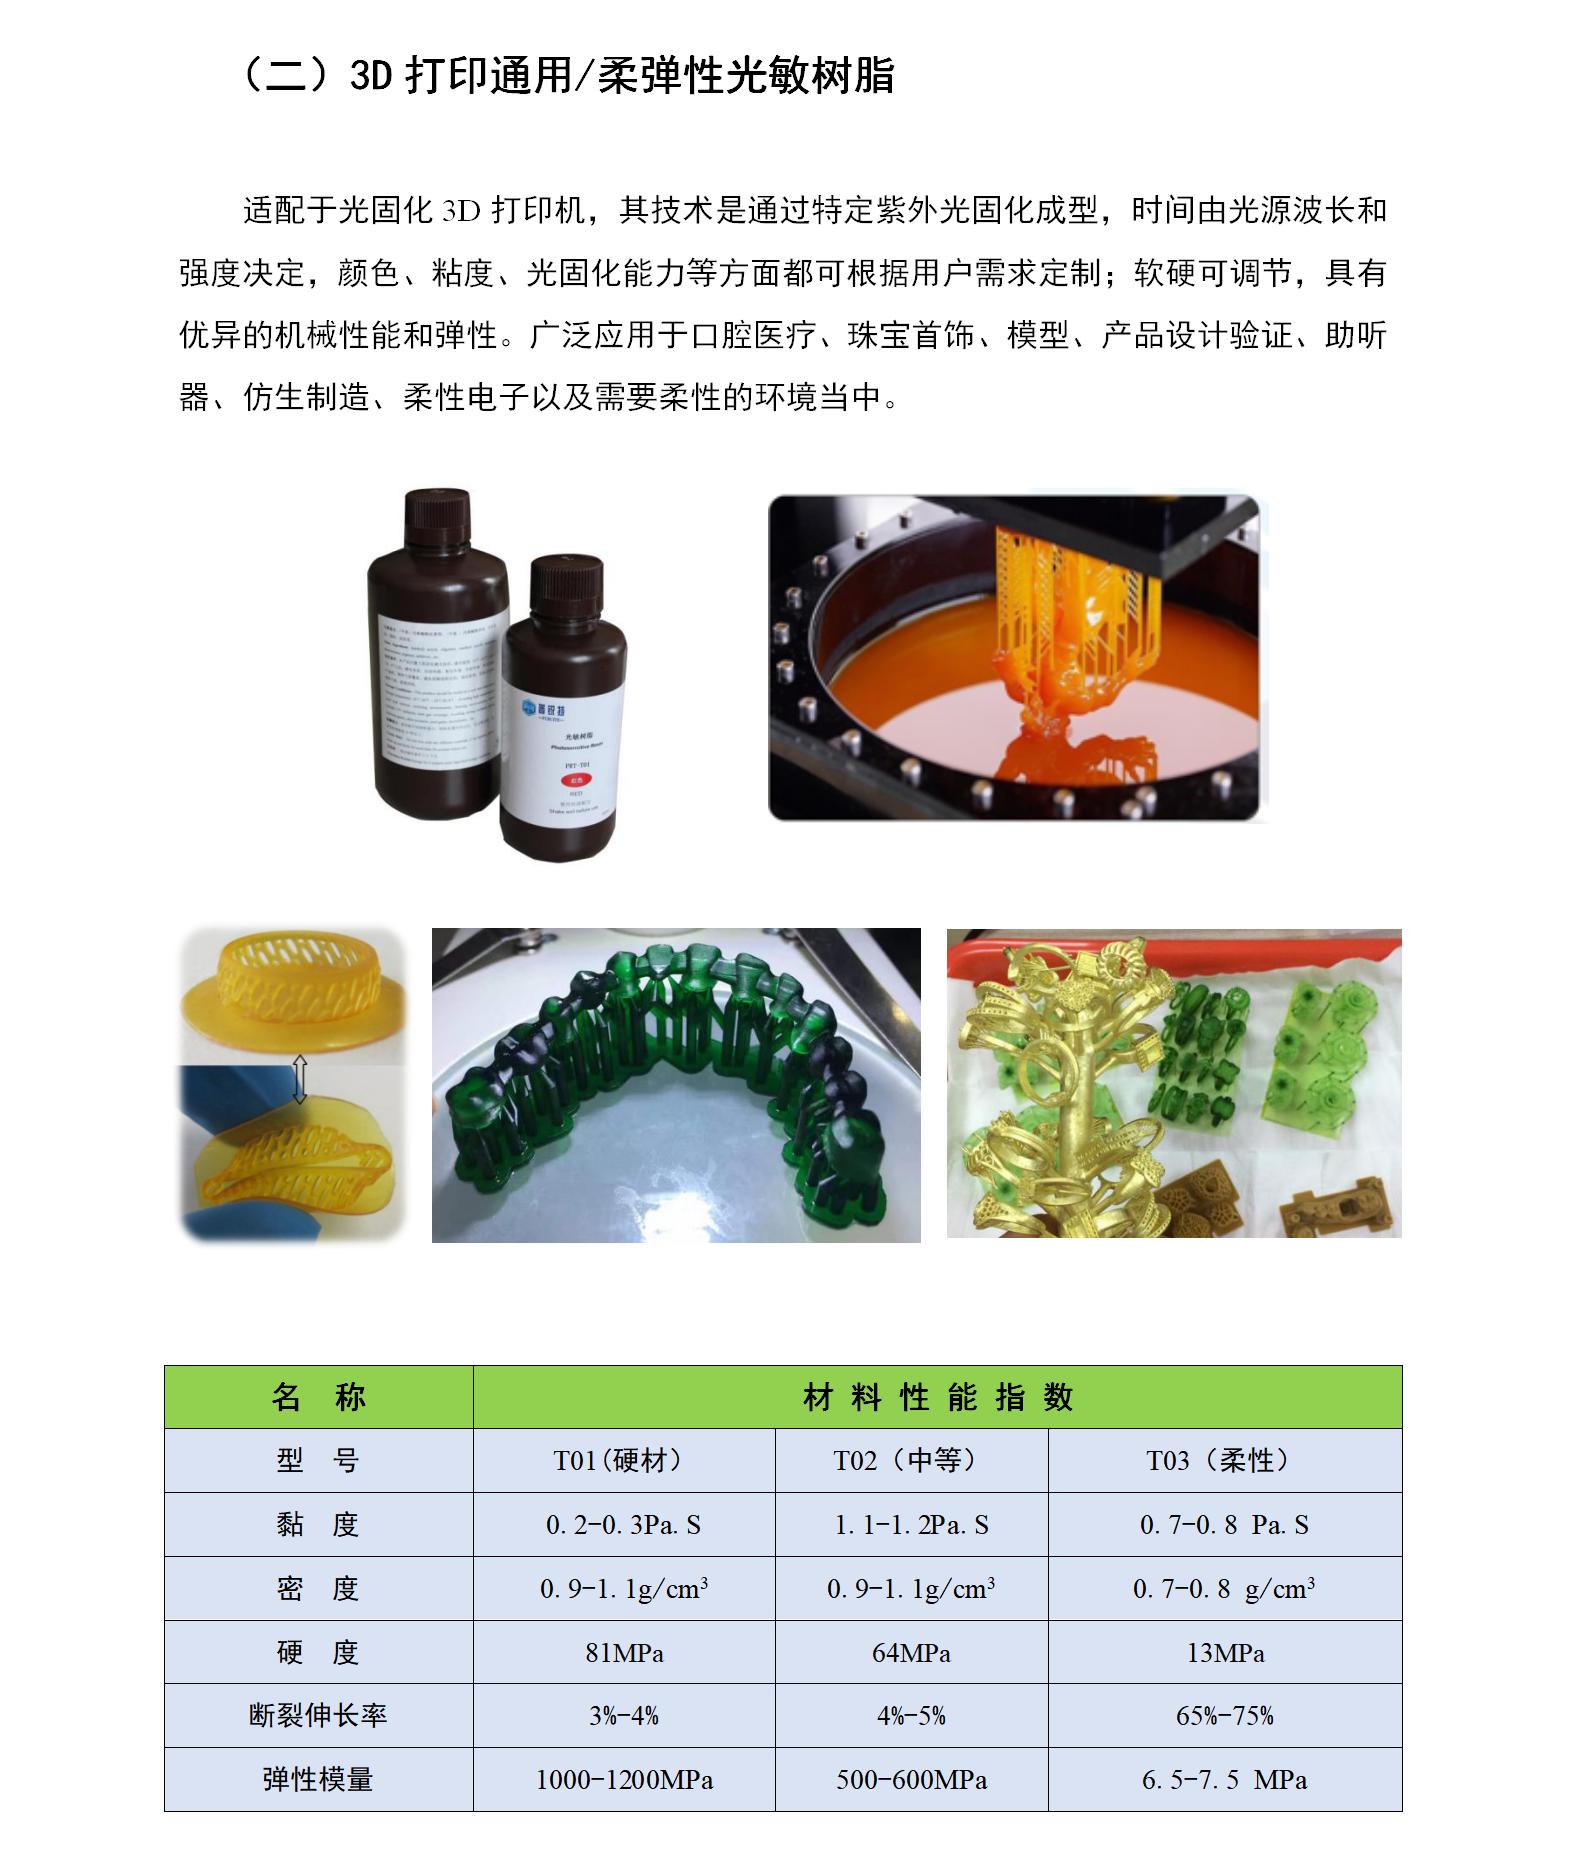 [CropImg]甘肃乐动体育app特科技有限公司2019V_06.png